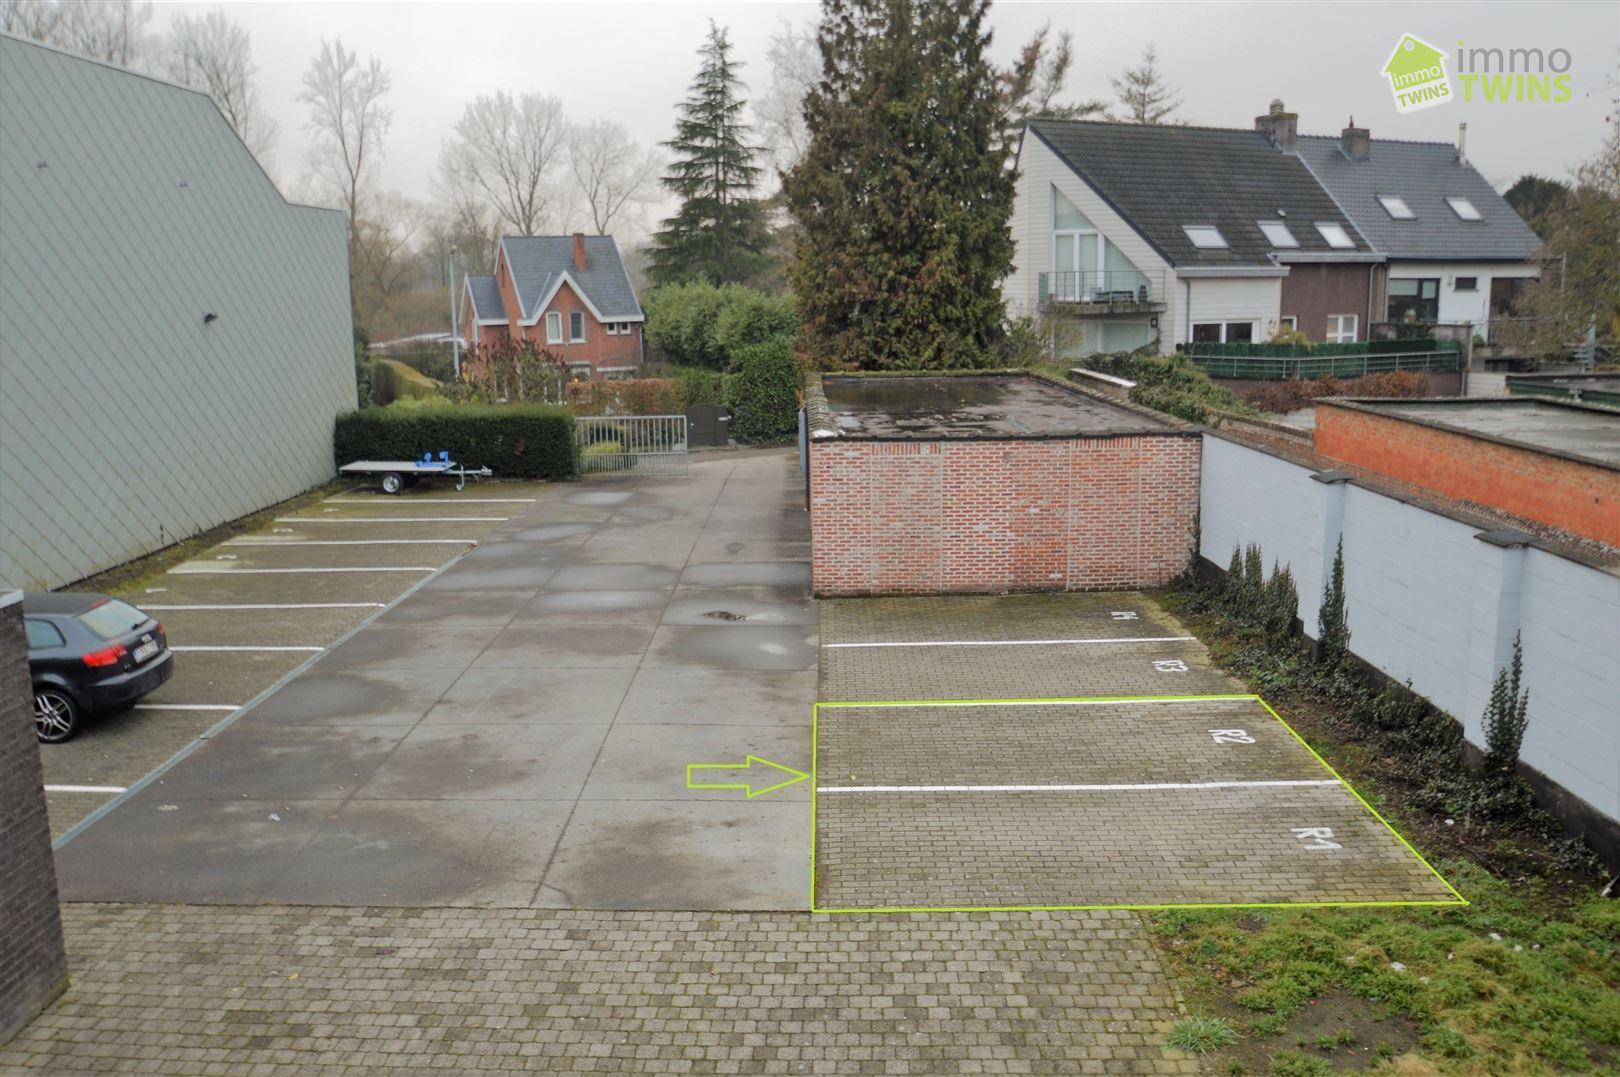 Foto 24 : Duplex/Penthouse te 2890 SINT-AMANDS (België) - Prijs € 449.000